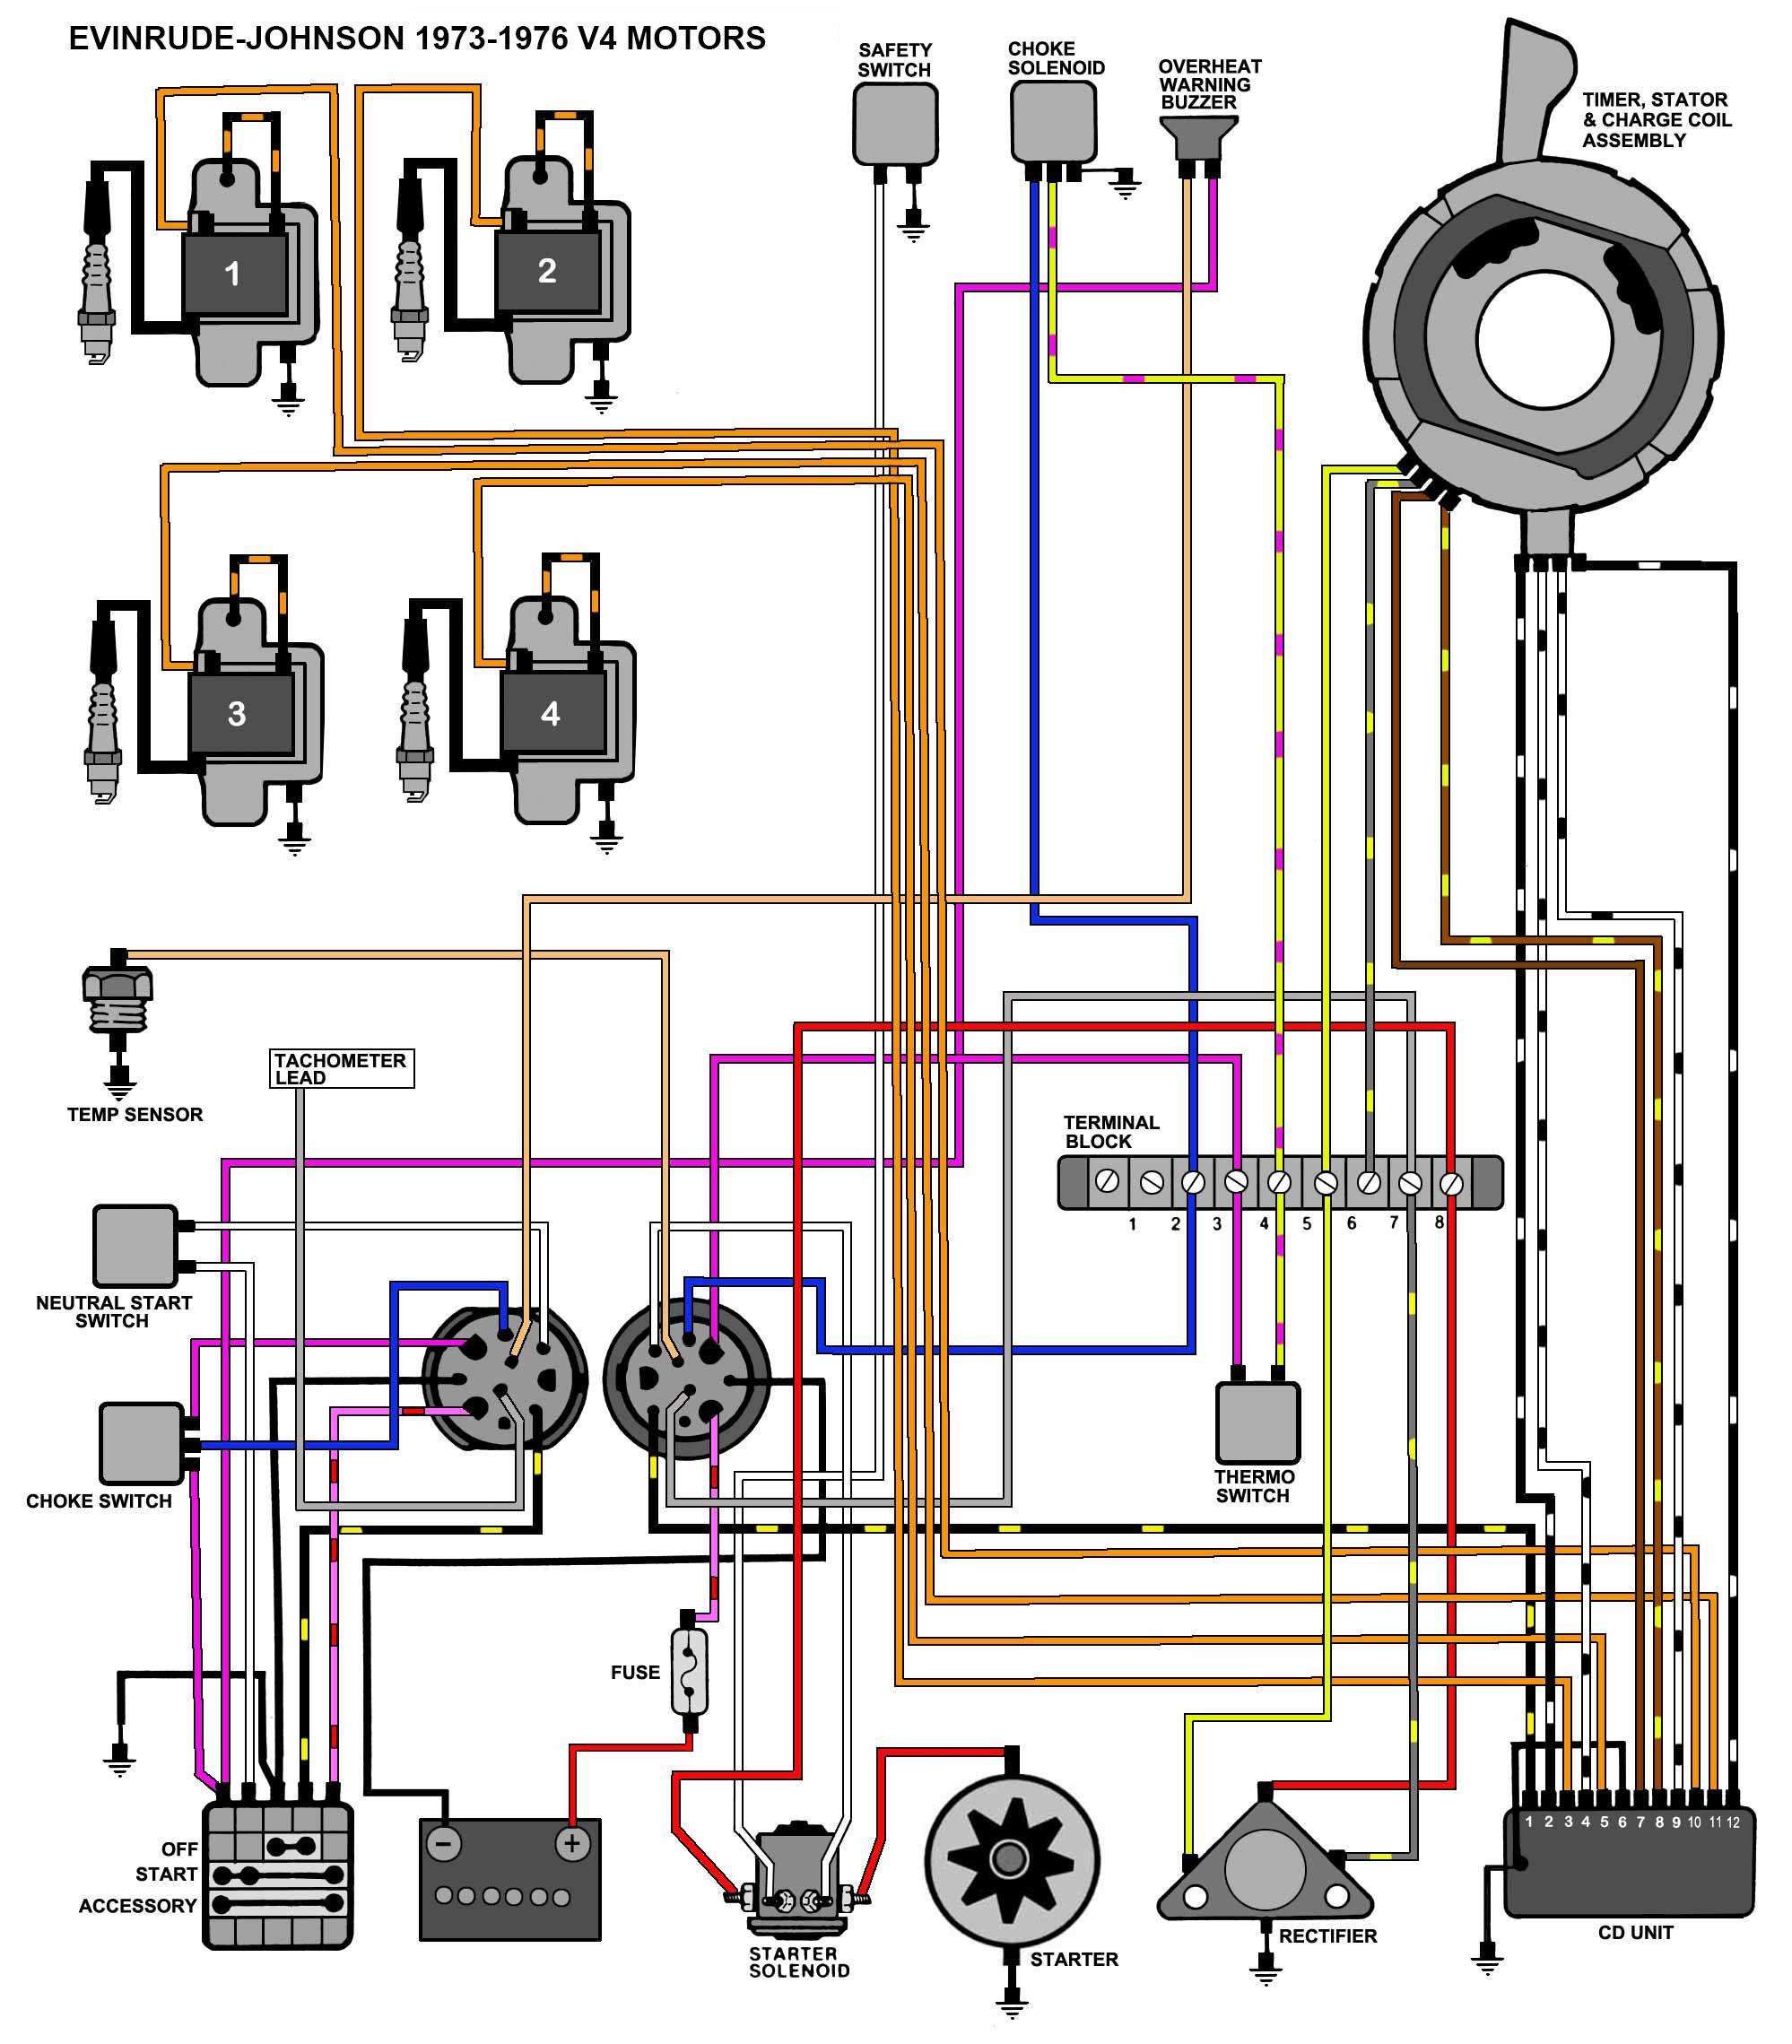 yamaha 9 9 wiring diagram wiring diagram data schema Schematics for Mercury Outboard Motors 70 hp force outboard motor wiring diagram yamaha wiring diagram yamaha 70 hp outboard wiring diagram